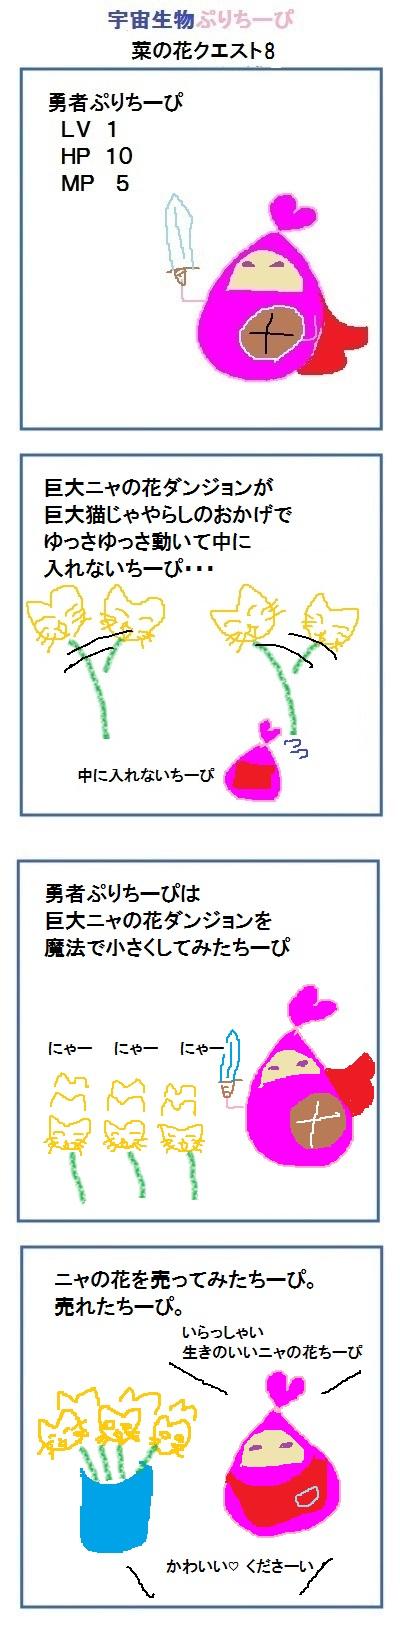 160322_nanohana_quest9.jpg